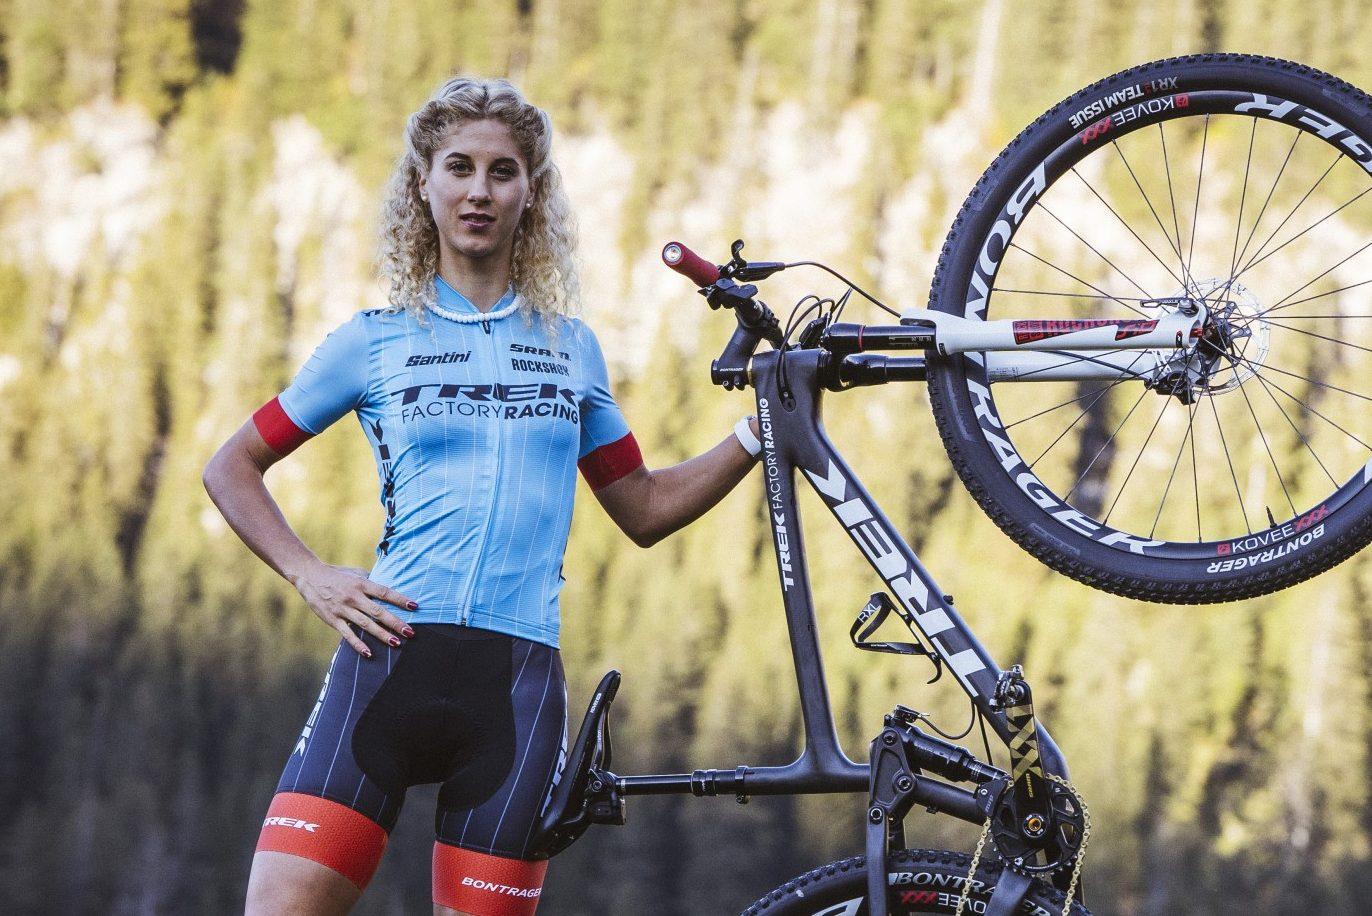 Jolanda Neff wins Olympic XC mountain biking gold - MBR